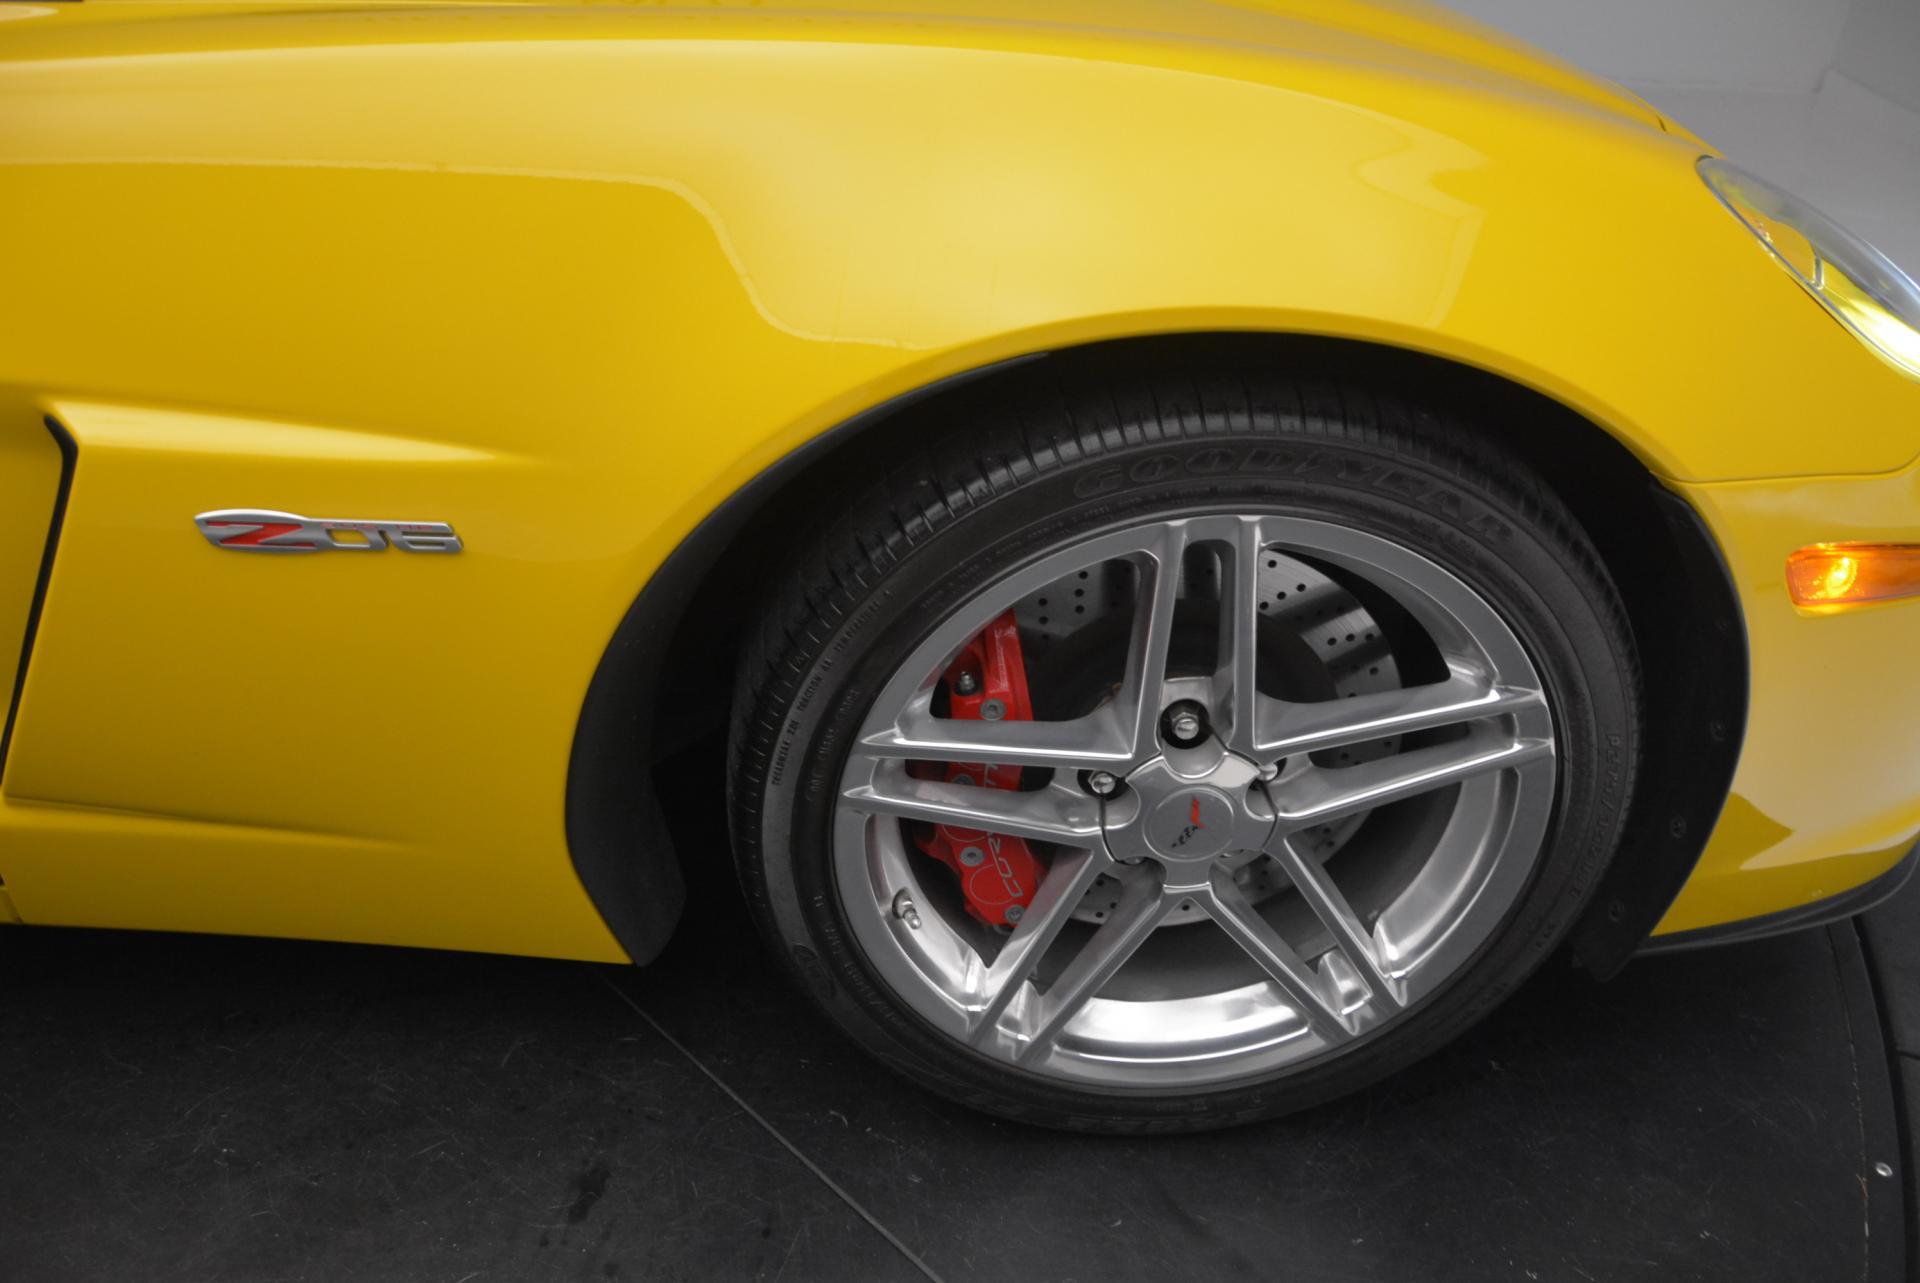 Used 2006 Chevrolet Corvette Z06 Hardtop For Sale In Westport, CT 530_p18